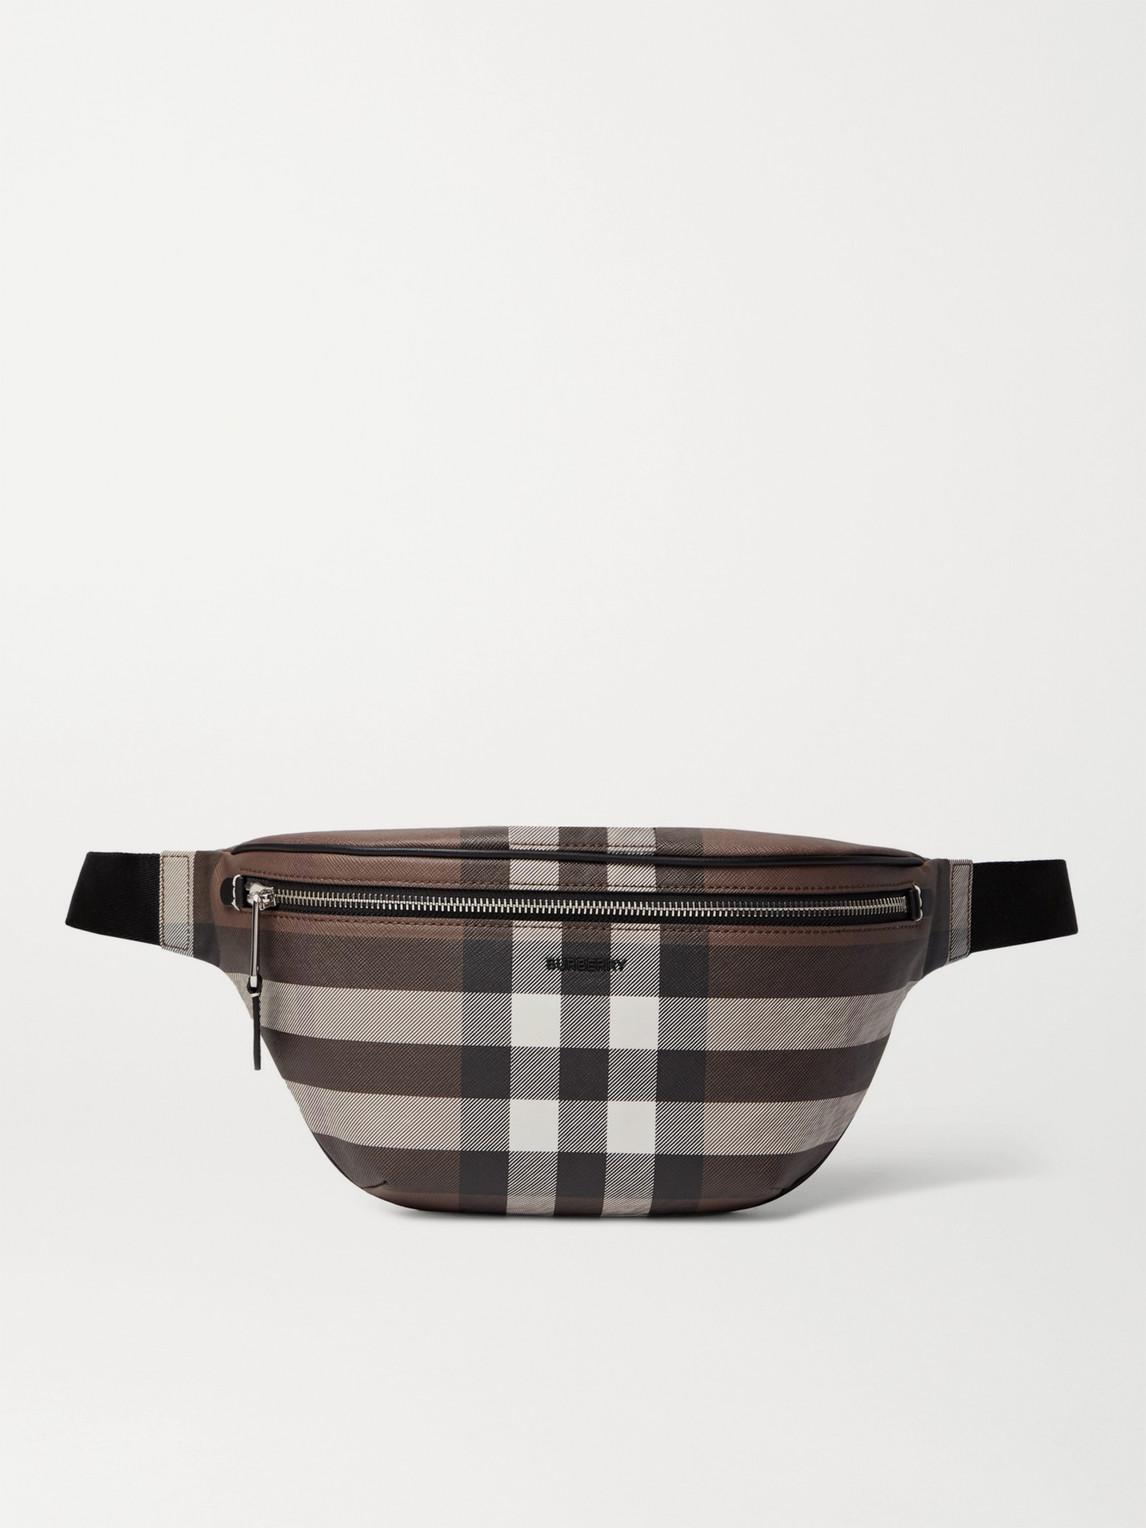 Burberry - Logo-Appliquéd Leather-Trimmed Checked E-Canvas Belt Bag - Men - Brown